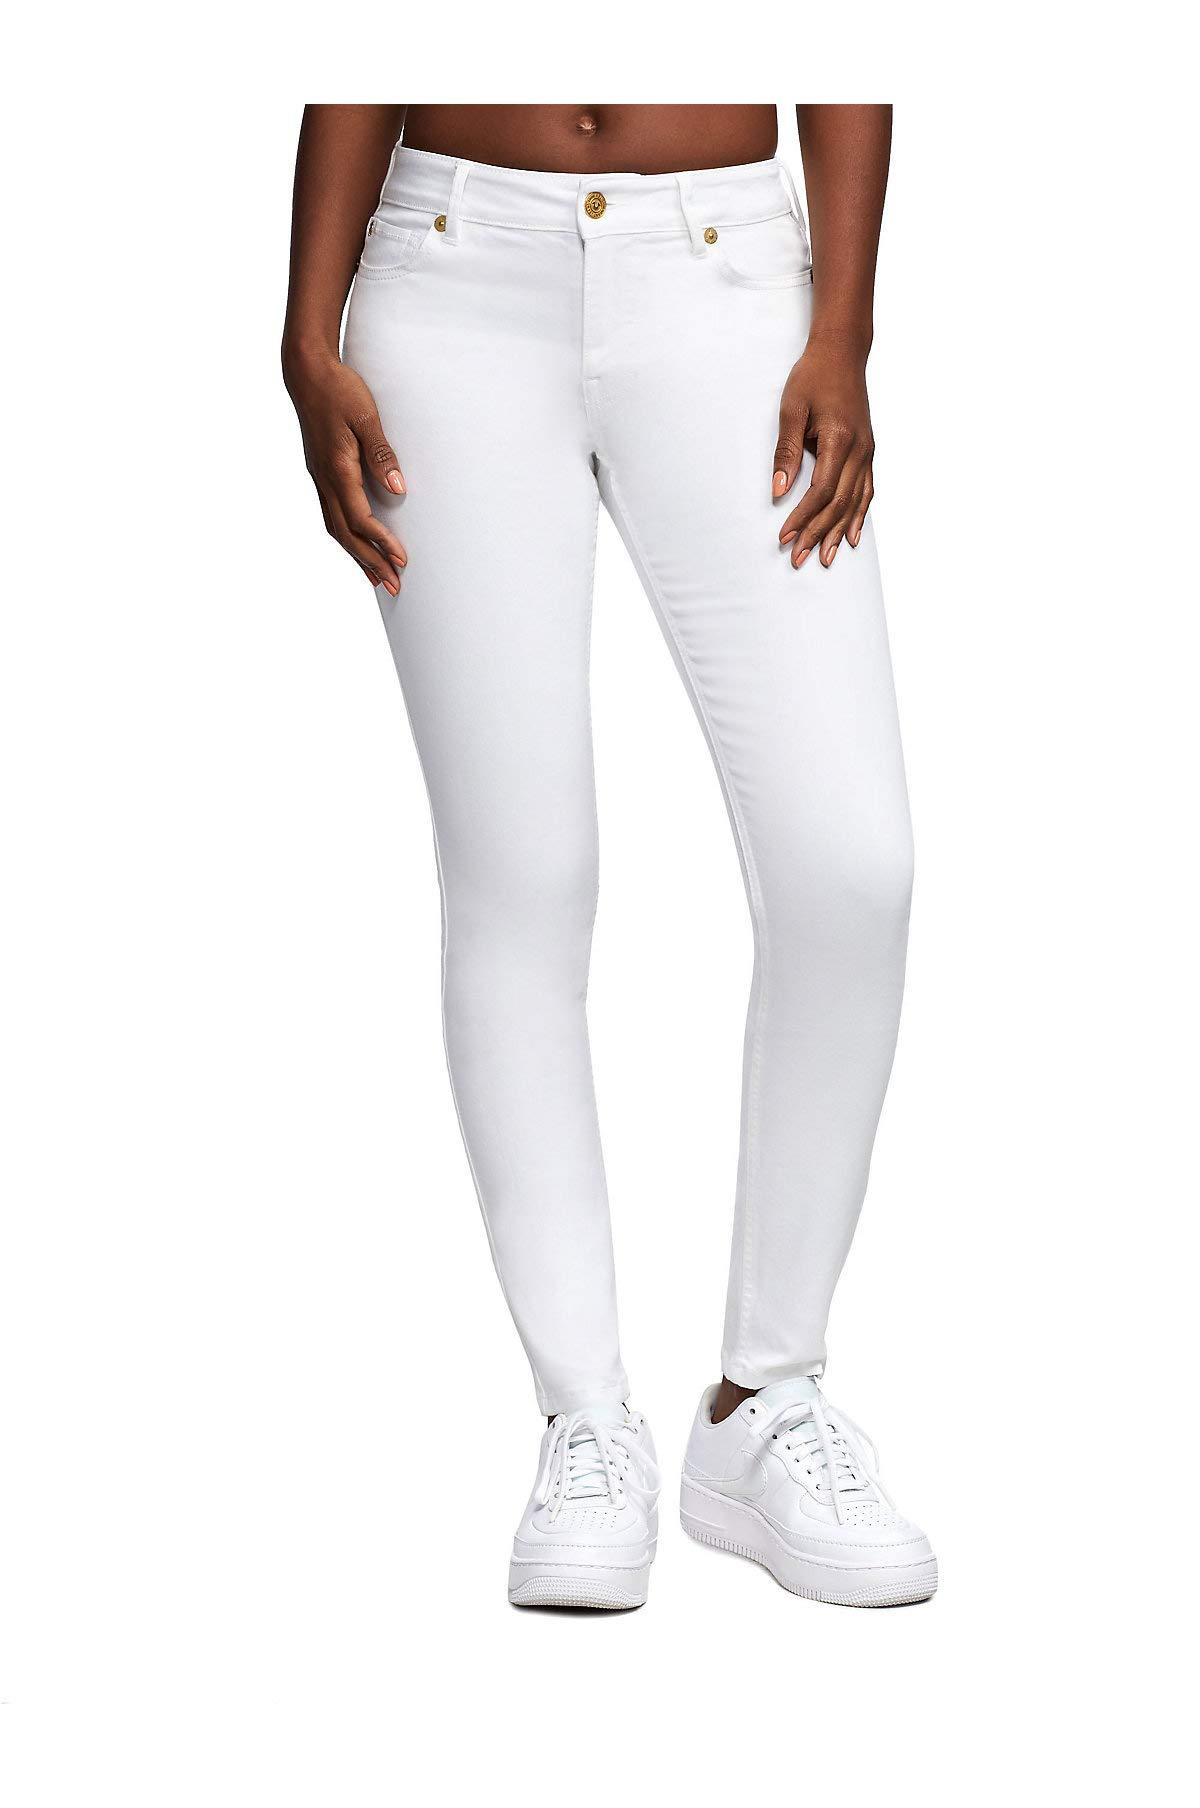 True Religion Women's X Manchester United Jennie Curvy Skinny Fit Stretch Jeans (24, White Water Wash) by True Religion